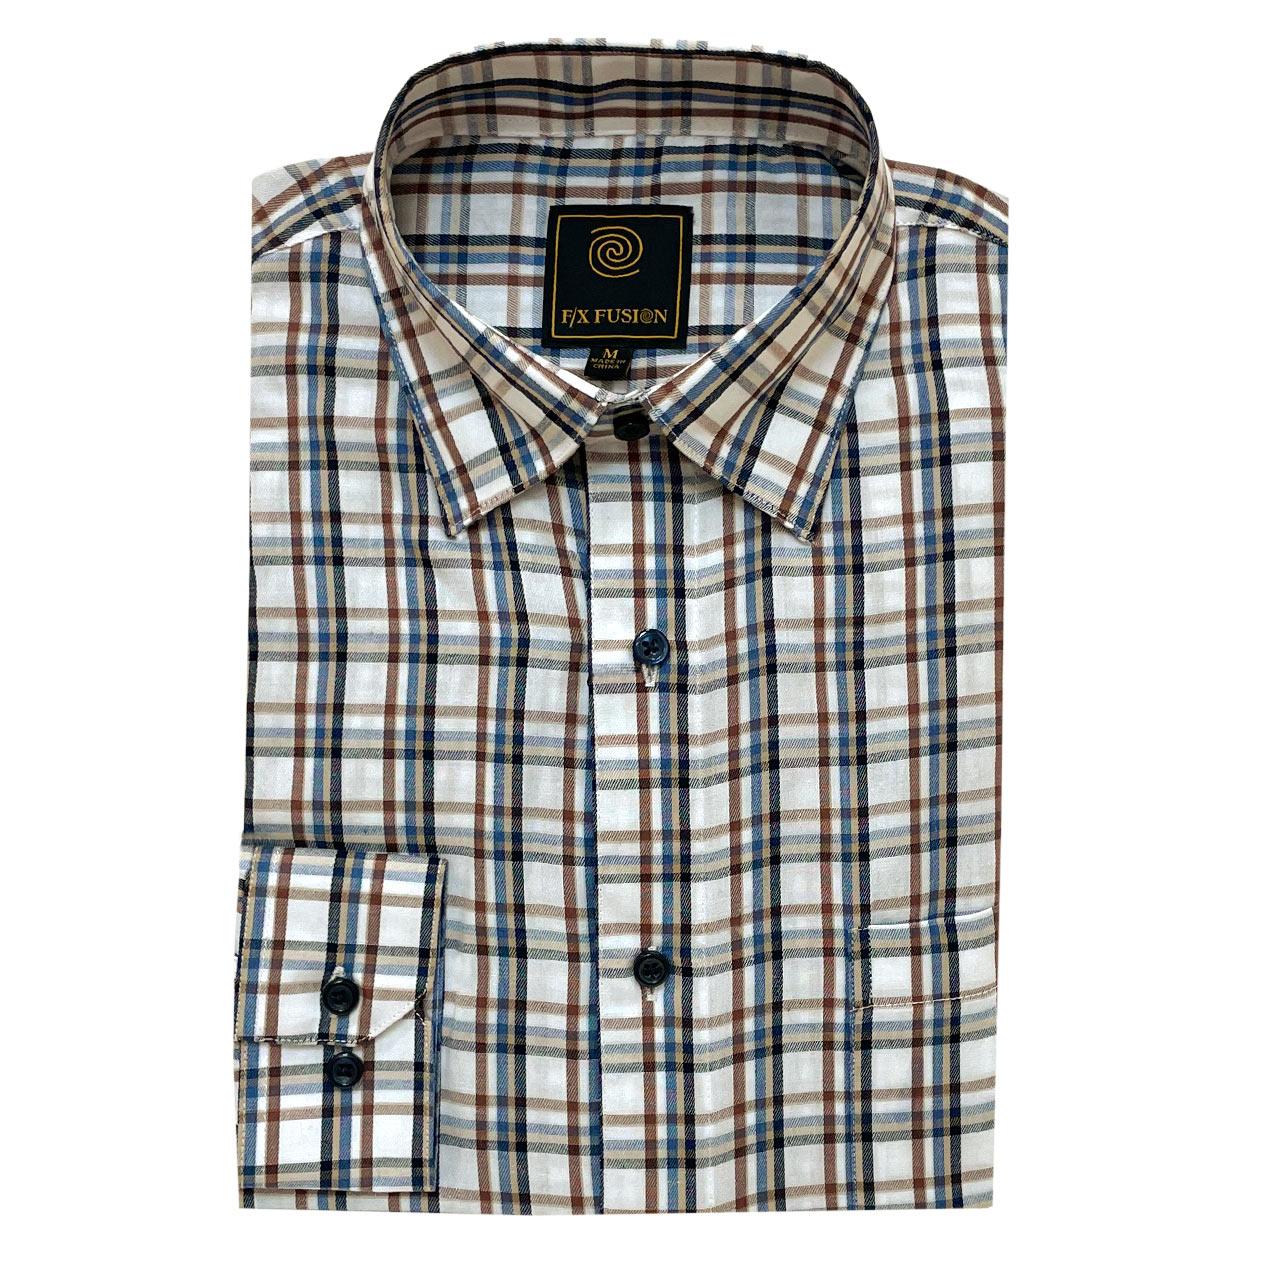 Men's F/X Fusion Long Sleeve Multi Twill Check Wrinkle Resistant Woven Sport Shirt #D1515 Ecru Multi